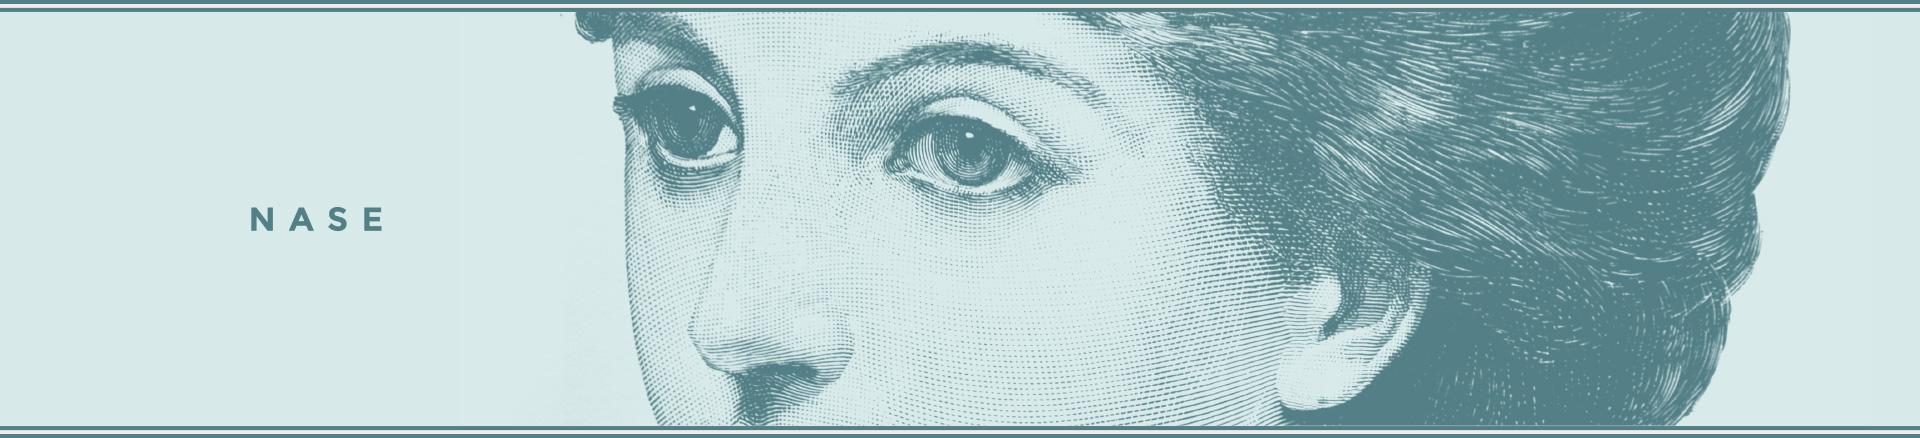 Nasenkorrektur Image